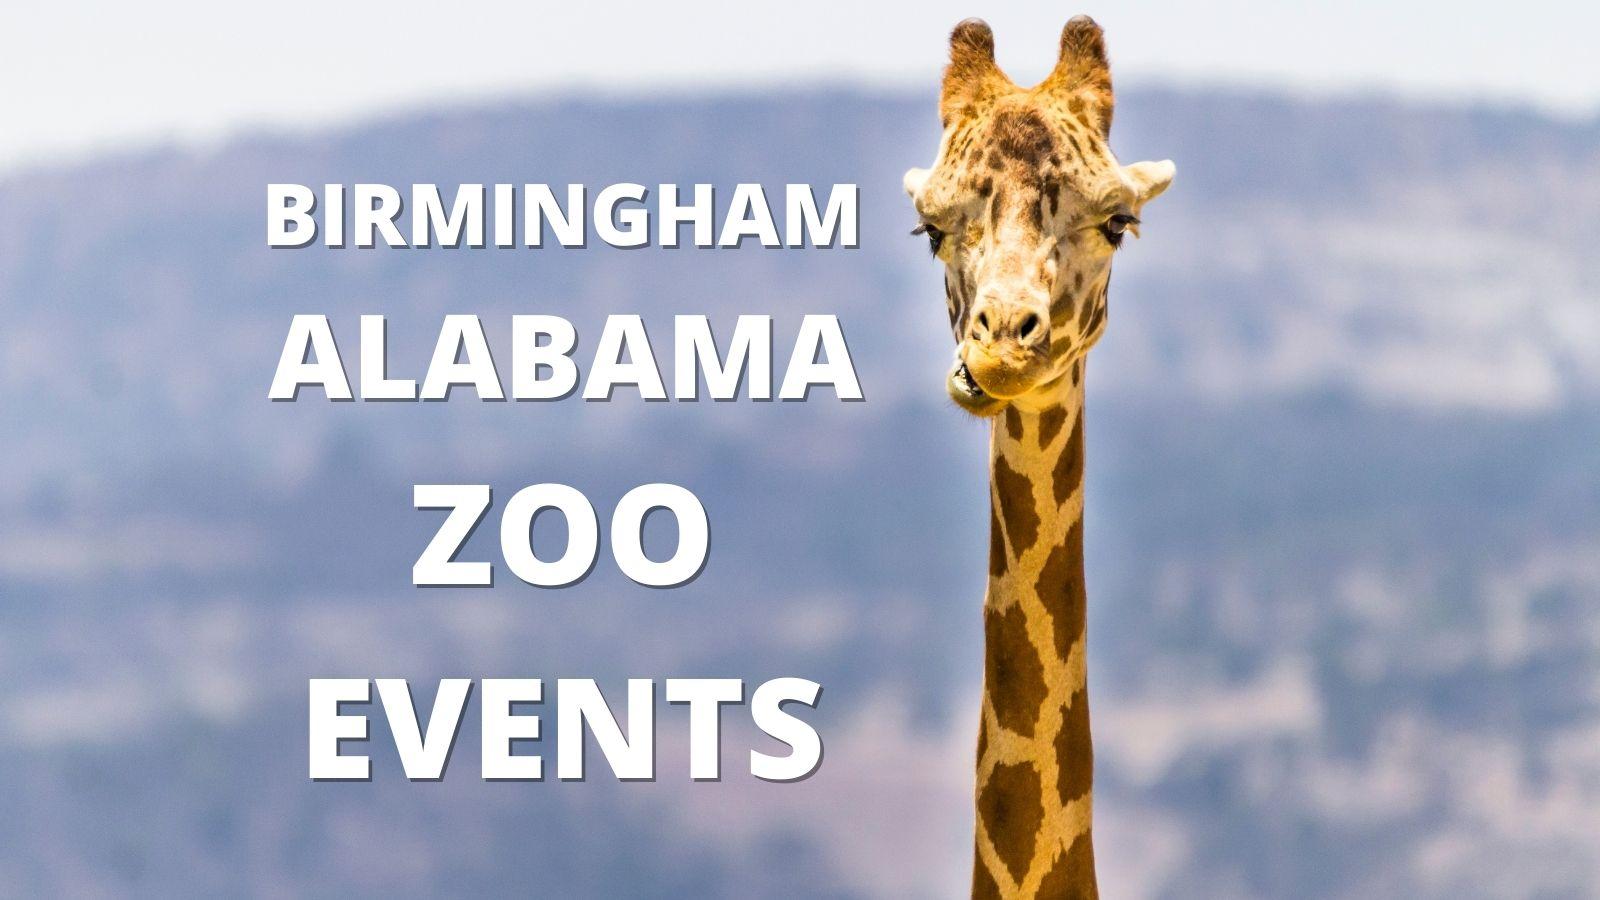 Birmingham Alabama Zoo Events